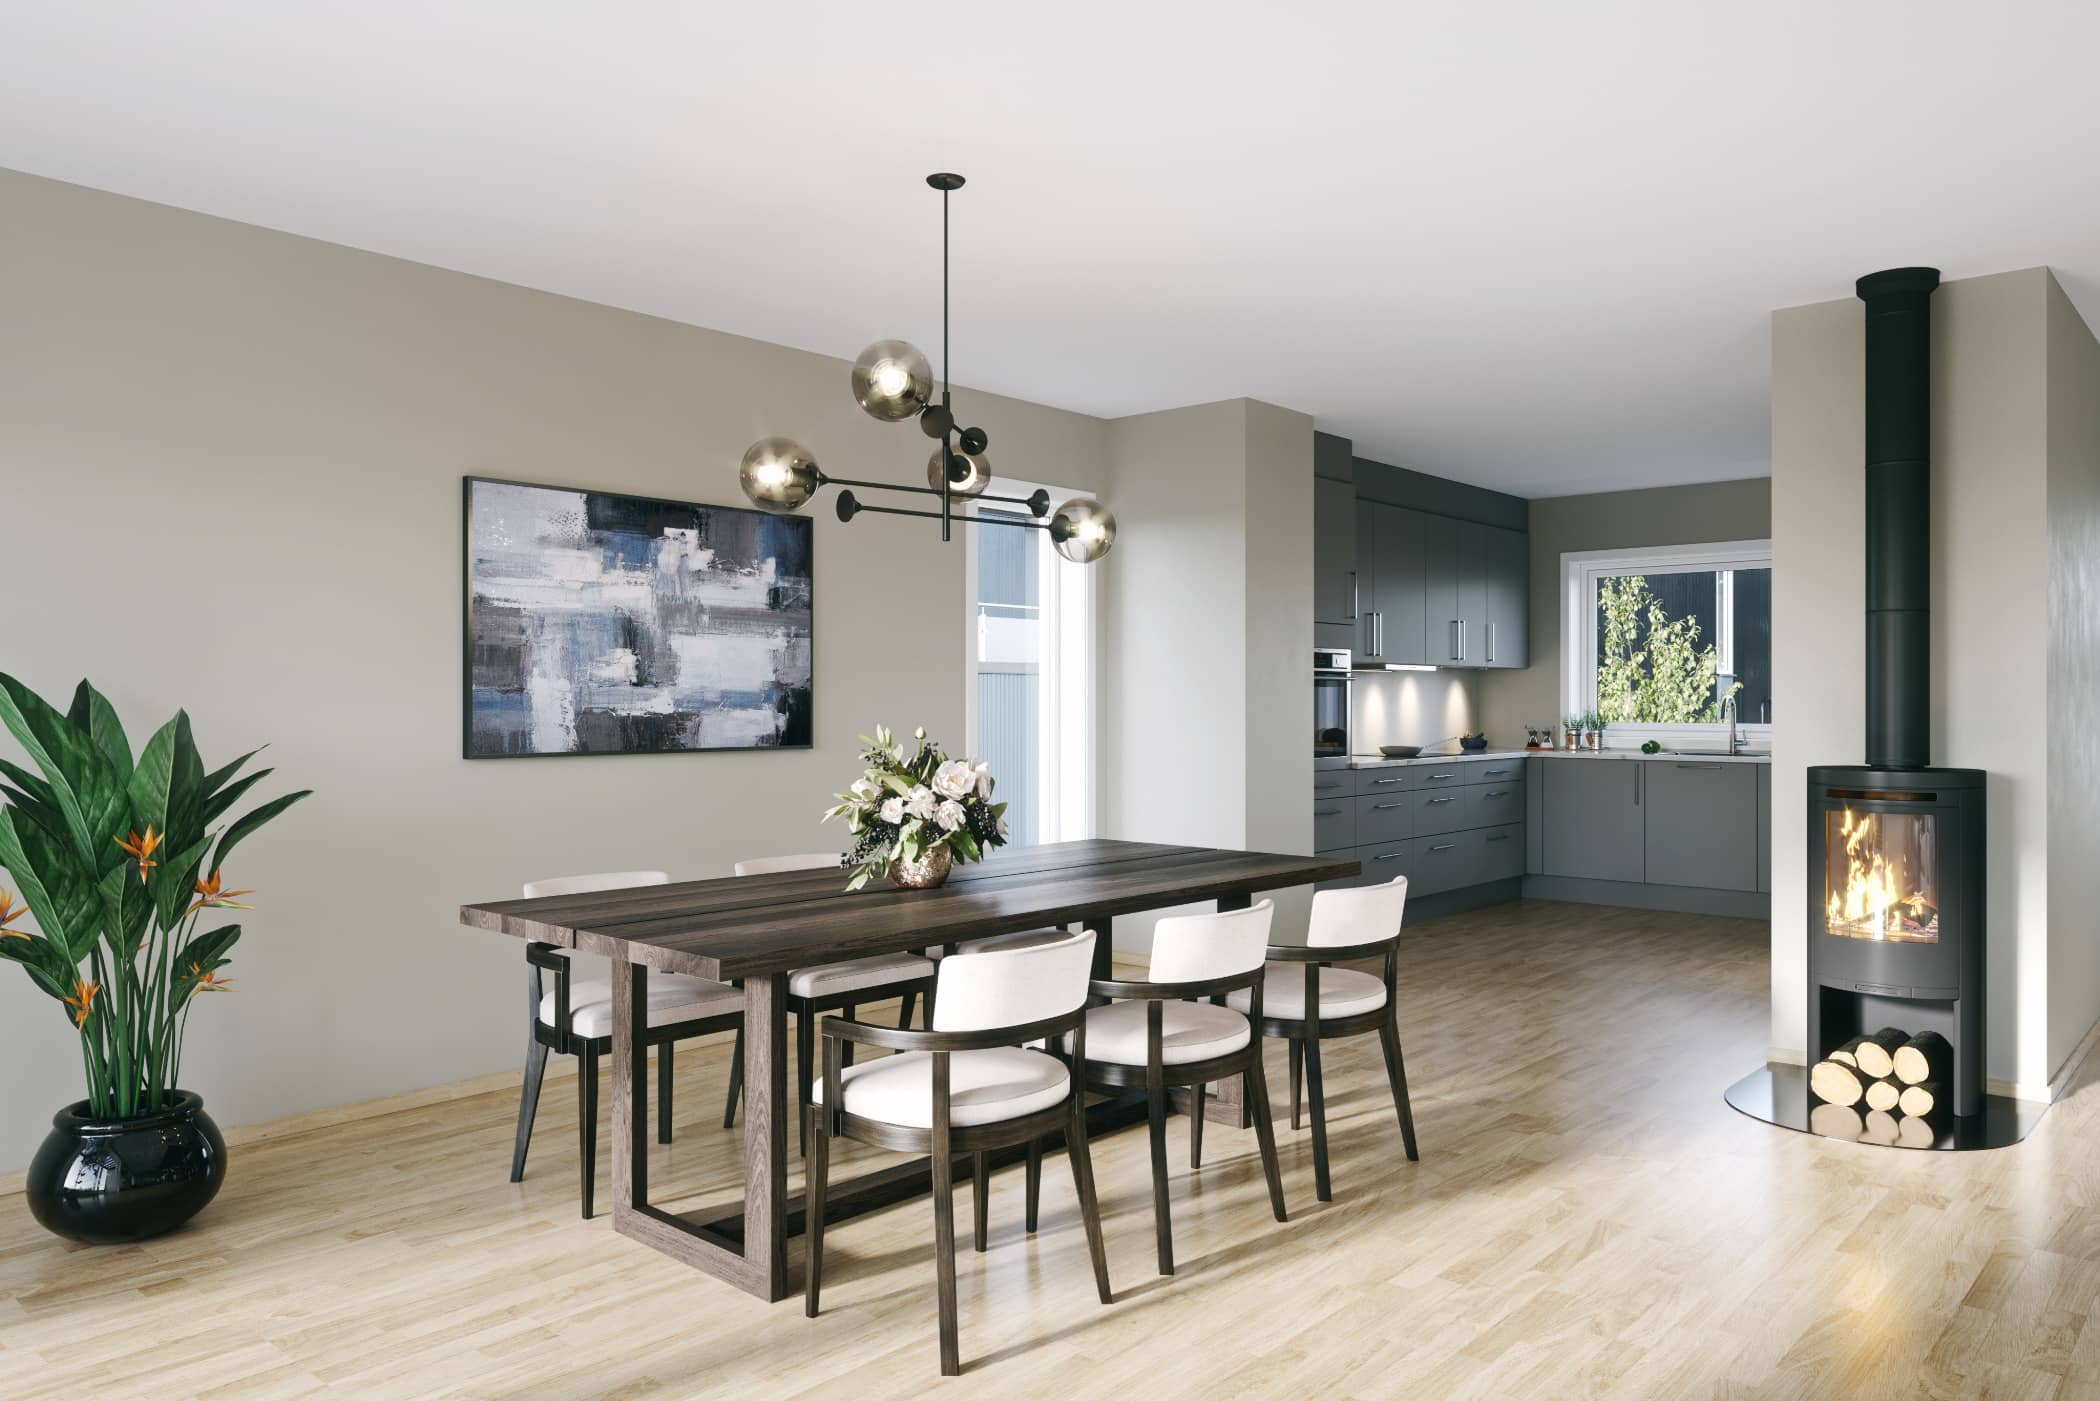 Living room, Interior design, Ceiling, Table, Building, Floor, Property, Furniture